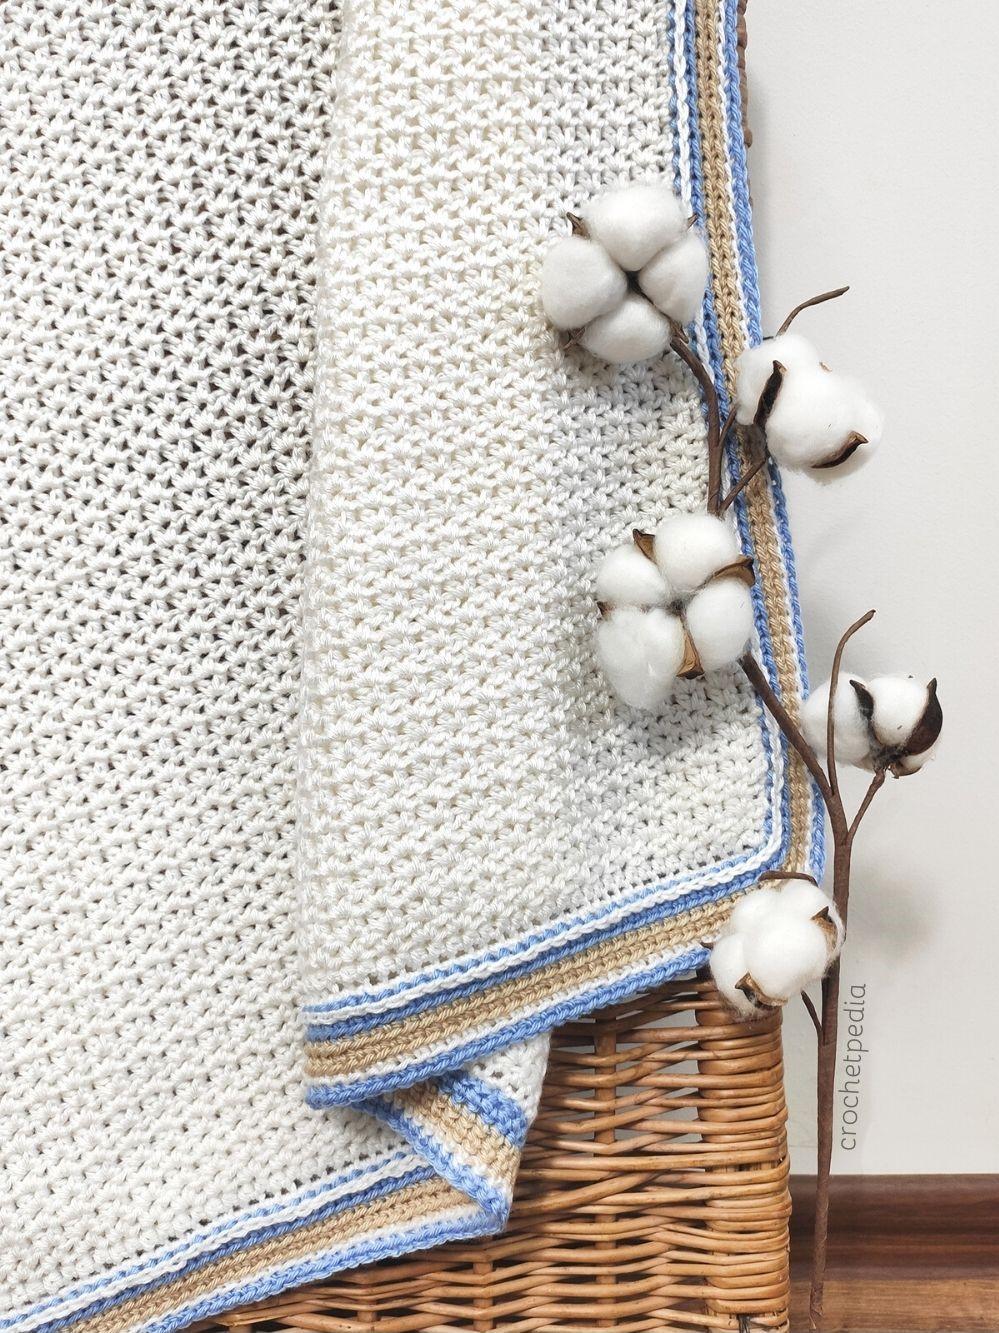 detail of white baby blanket